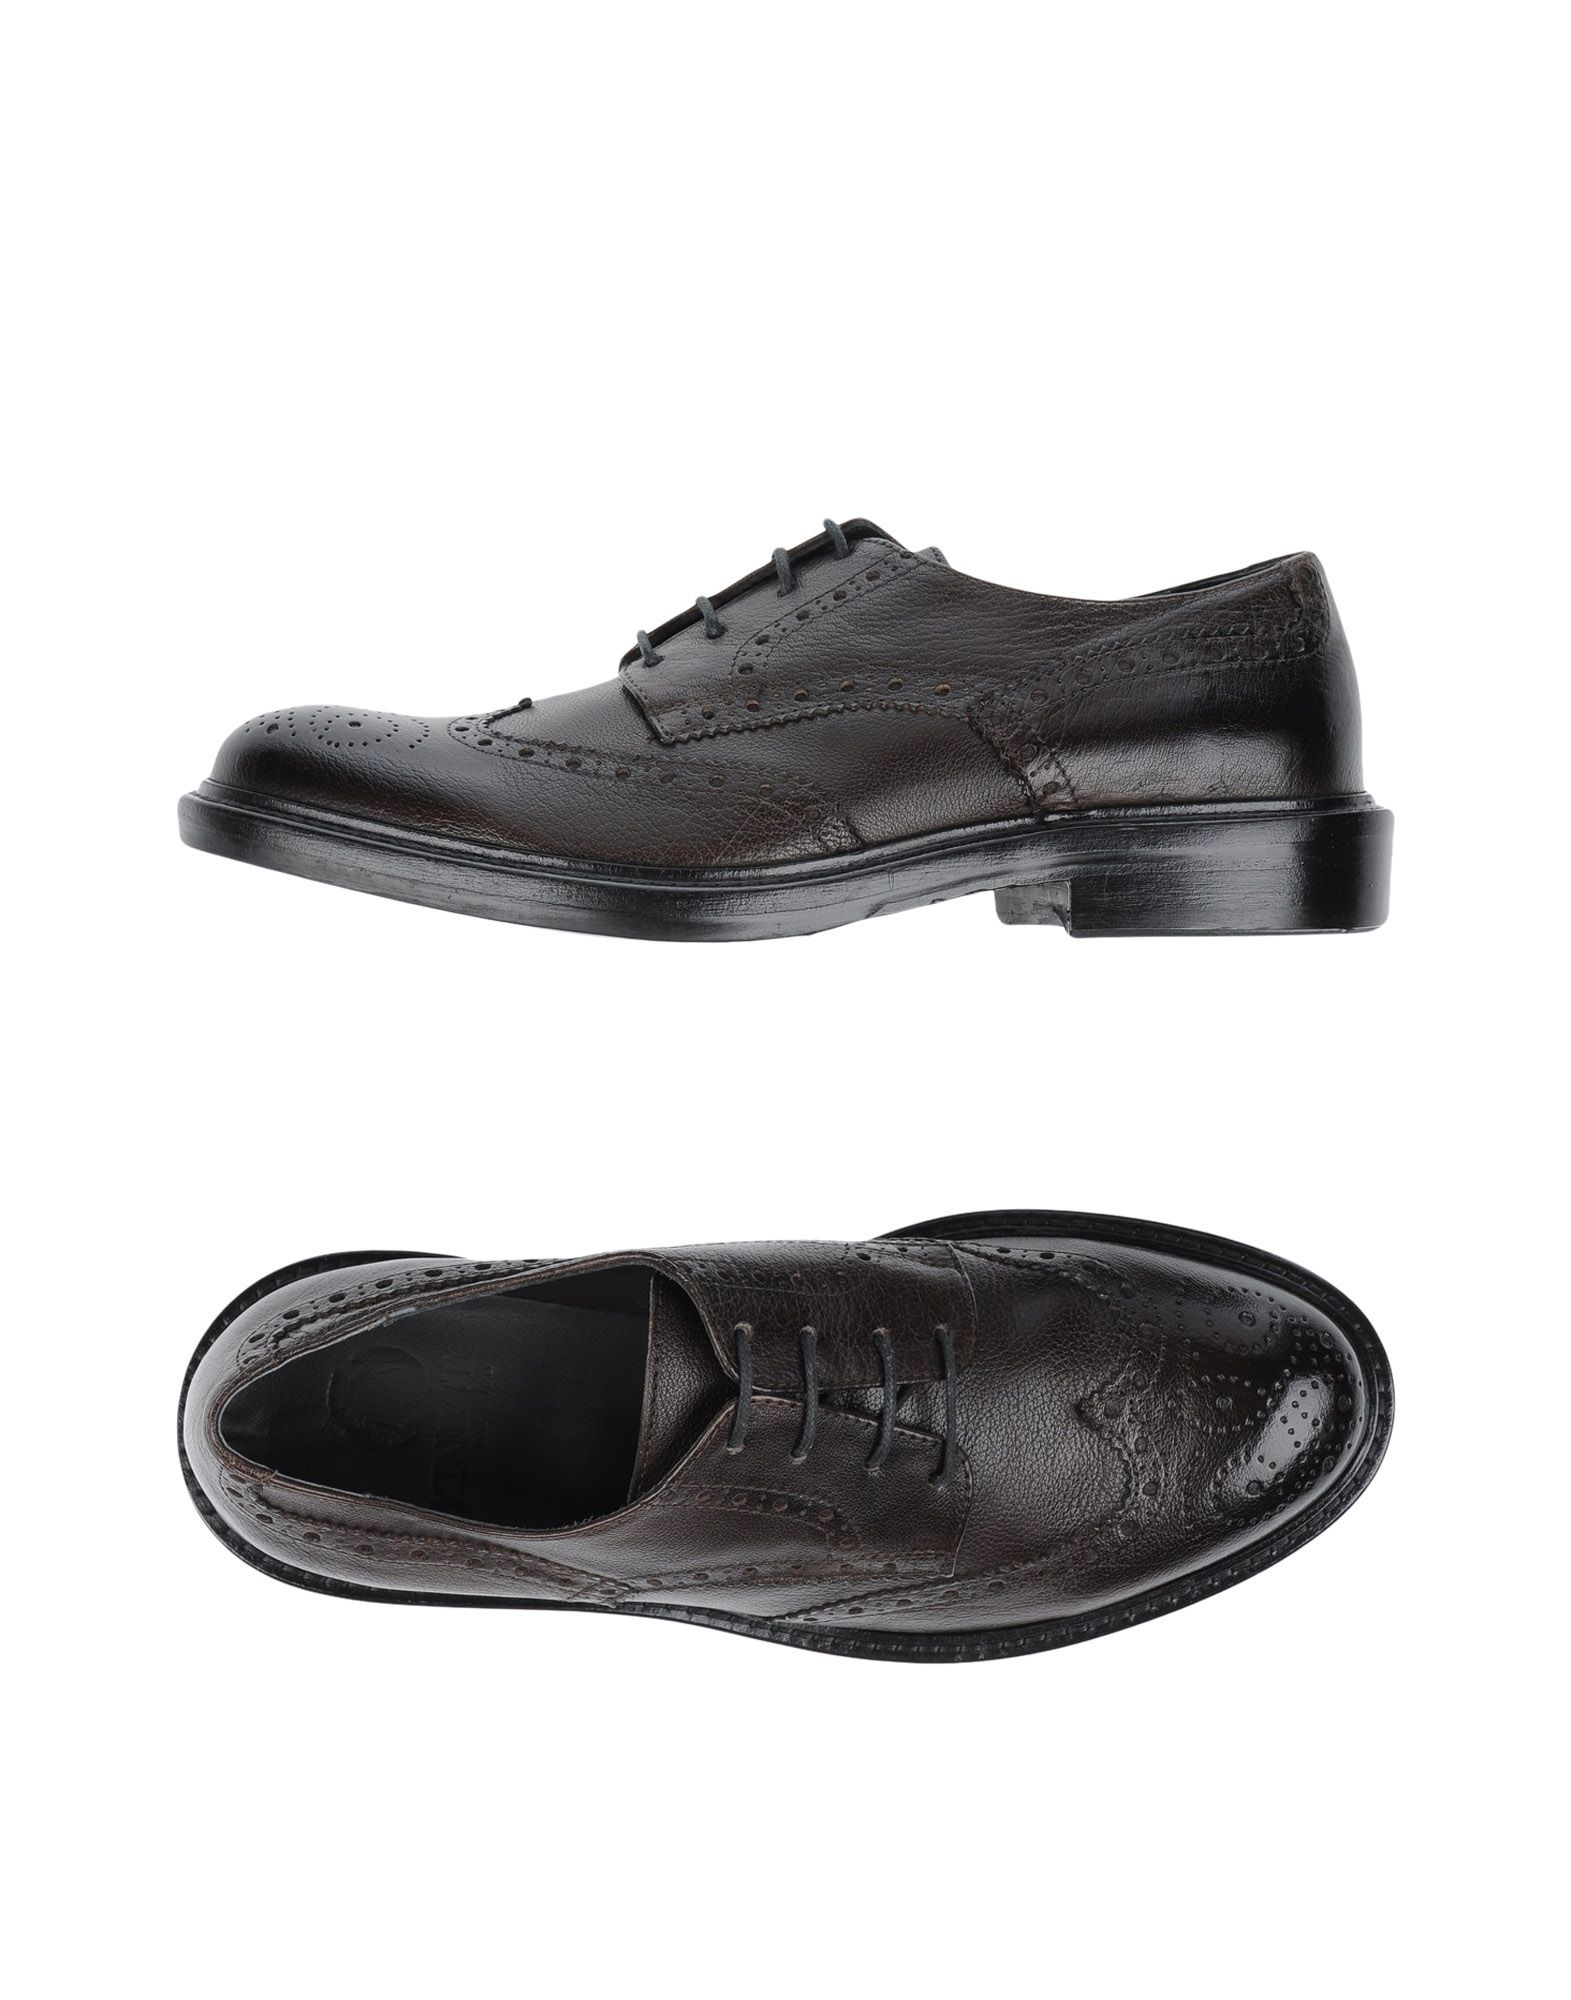 Chaussures À Lacets Kingston Femme - Chaussures À Lacets Kingston sur